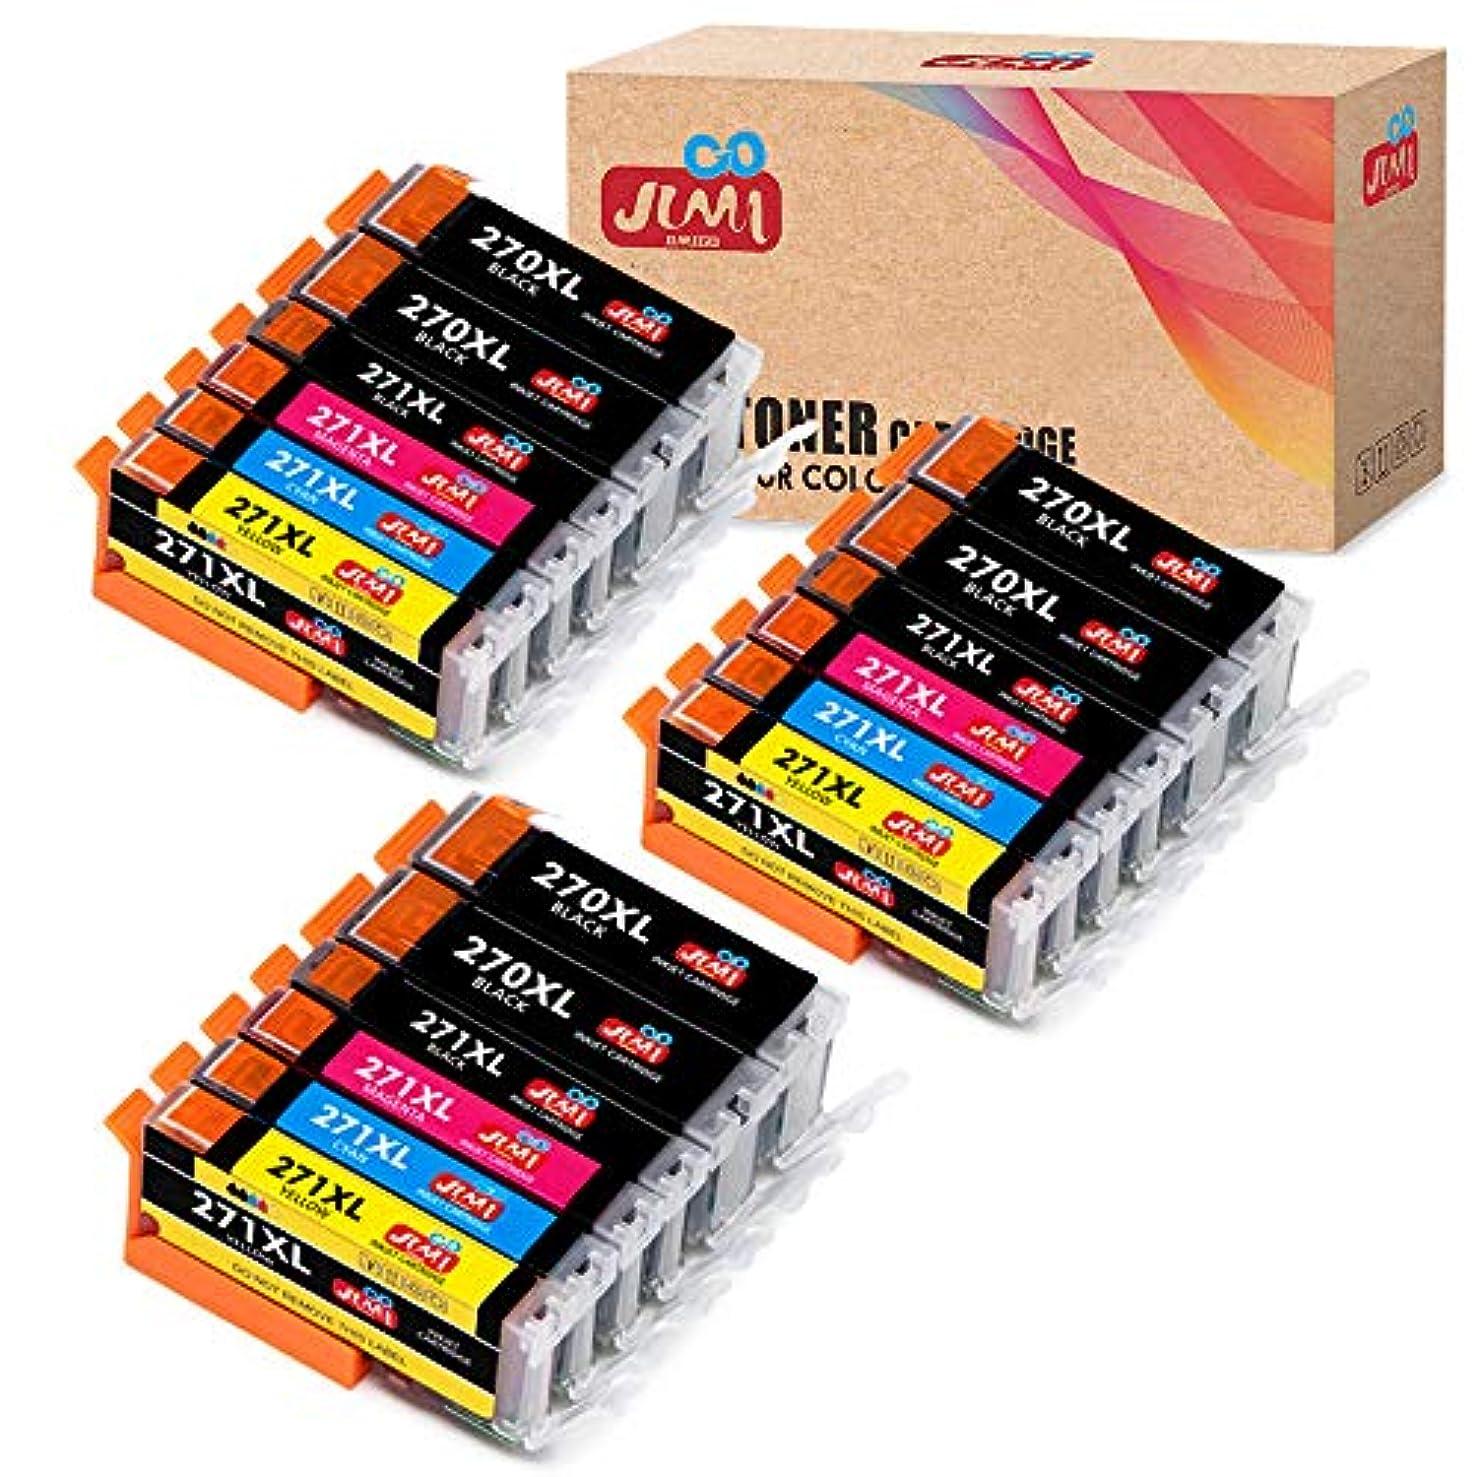 JIMIGO 18-Pack PGI-270XL CLI-271XL Compatible Ink Cartridges for Canon PGI-270 CLI-271 Ink, High Yield 5 Colors, Work with Canon PIXMA TS5020 TS6020 MG6820 MG6821 MG6822 MG5720 MG5721 MG5722